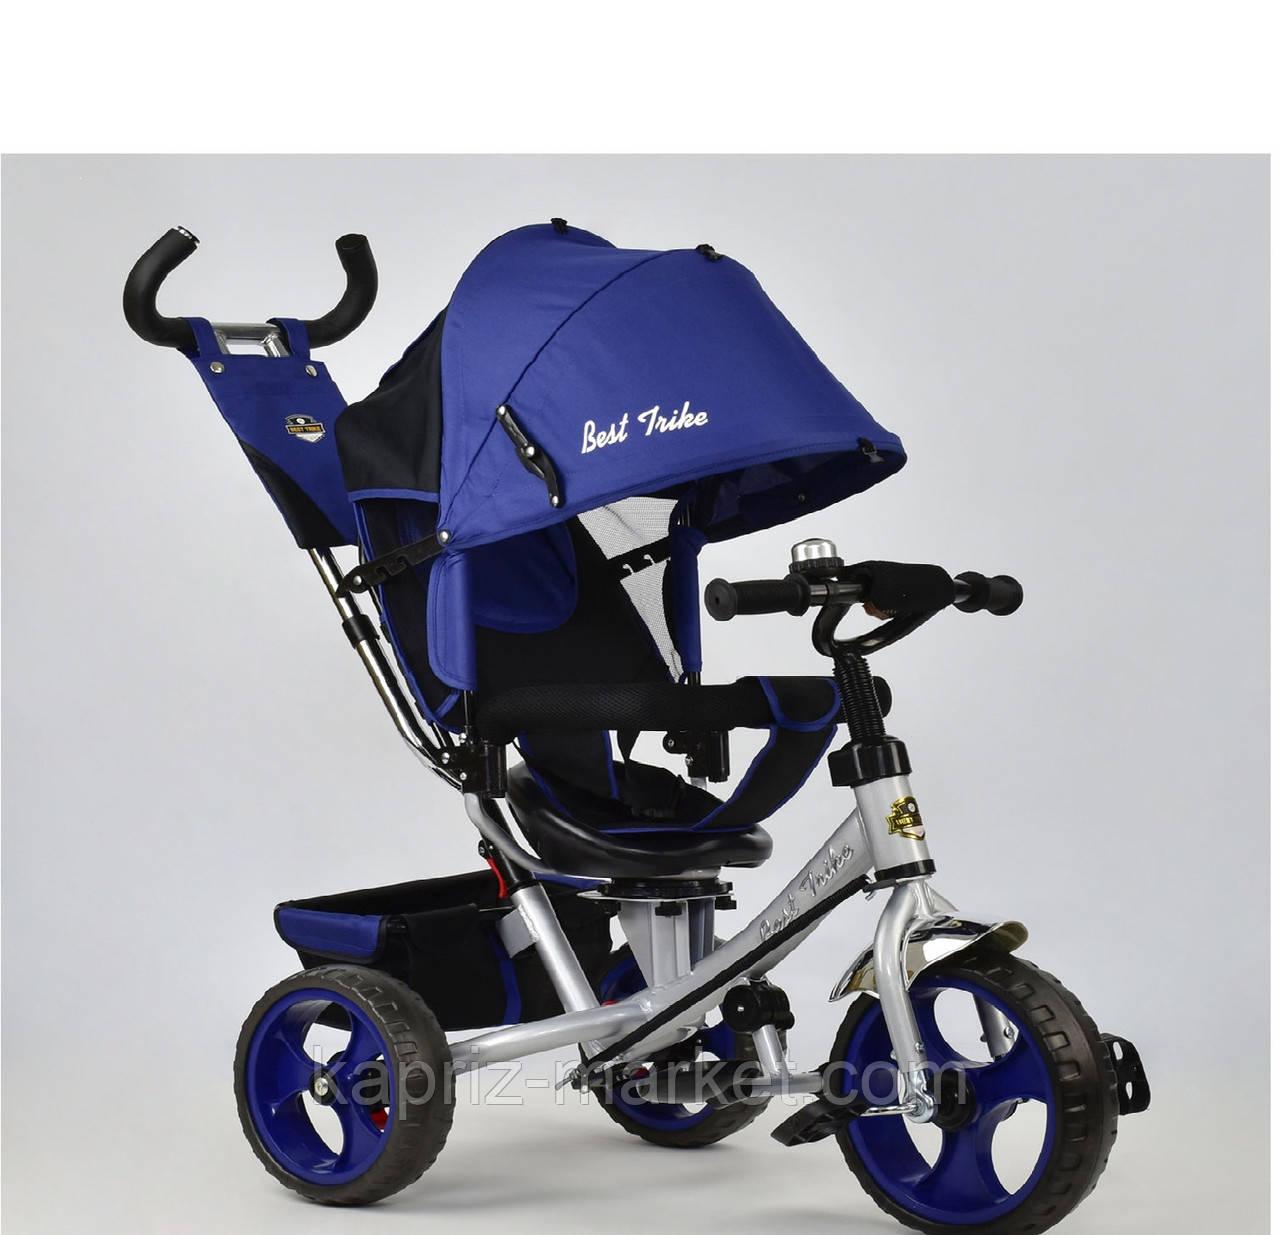 Велосипед трехколесный BEST TRIKE,синий, колеса пена, фото 1